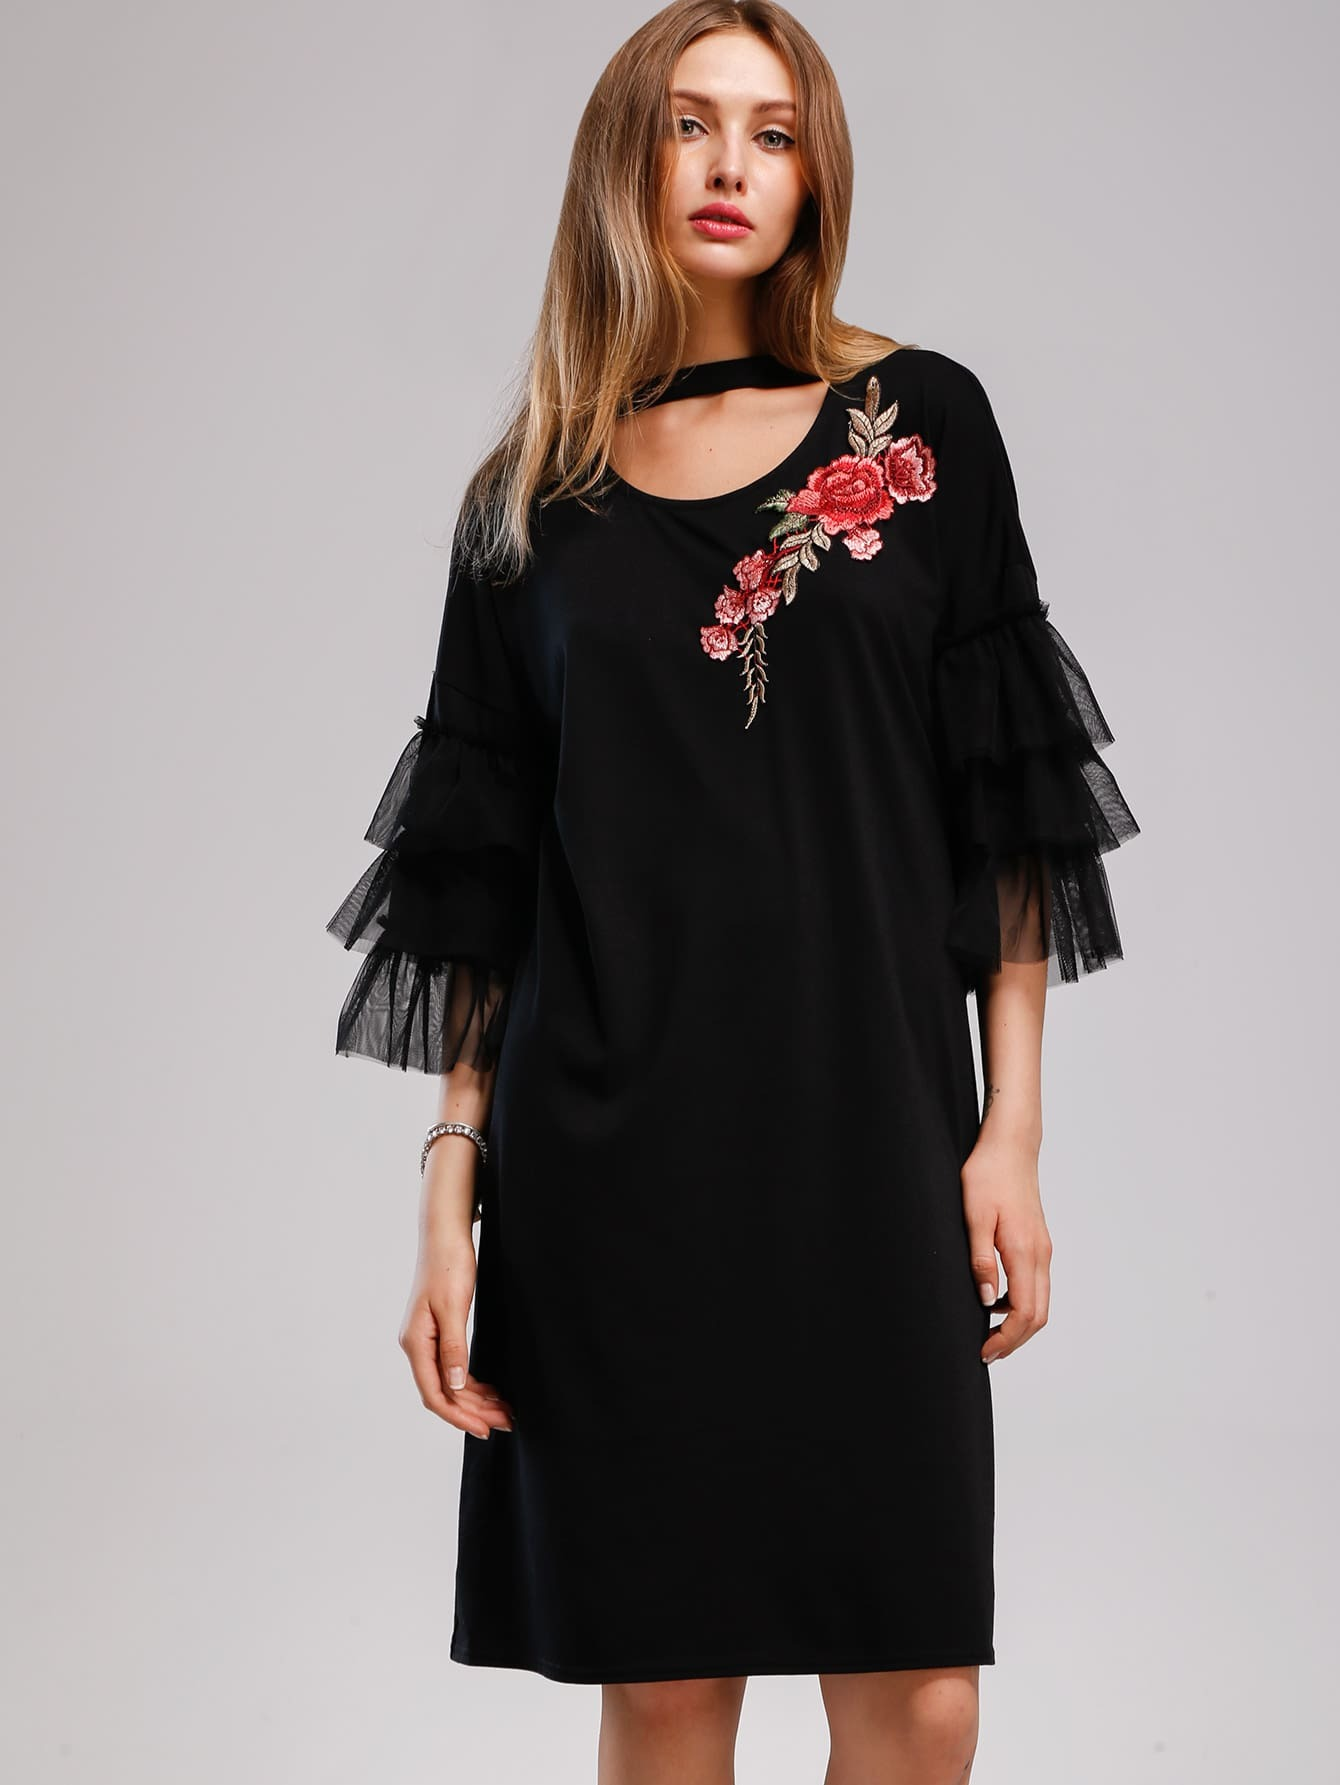 Фото Appliques Contrast Tiered Mesh Cuff Choker Dress. Купить с доставкой